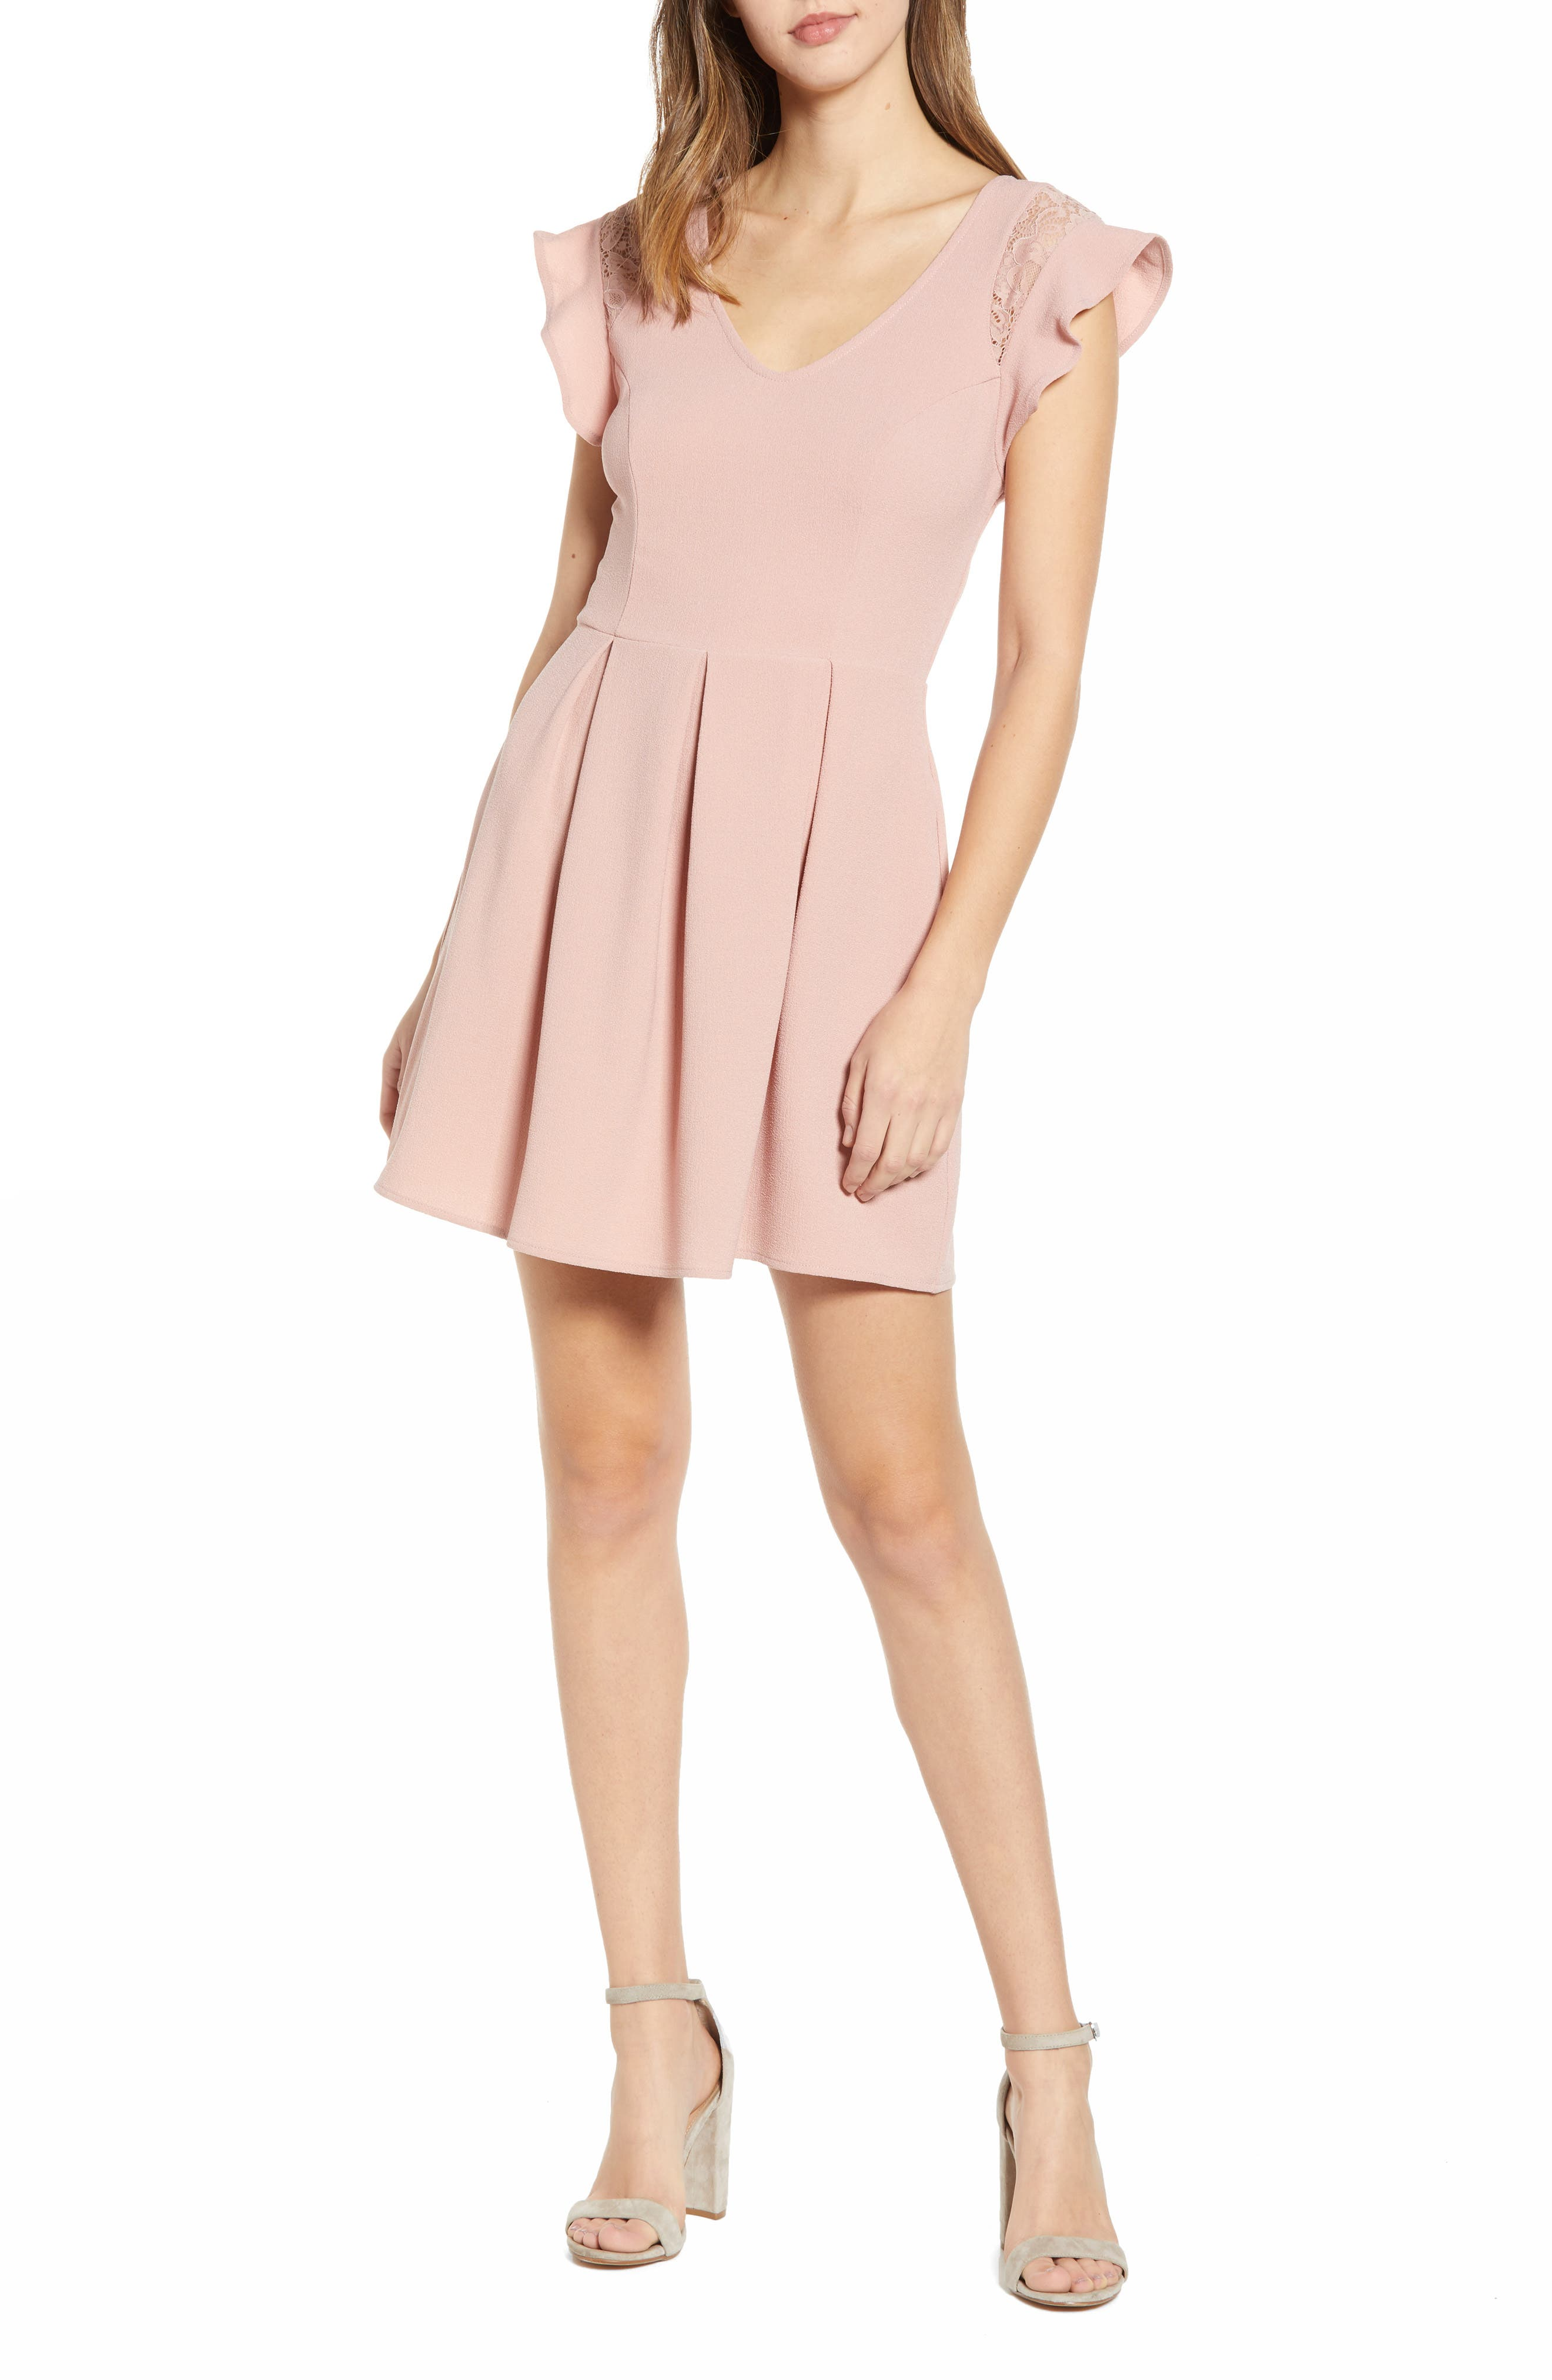 SPEECHLESS Crepe Flutter Sleeve Fit & Flare Dress, Main, color, ANTIQUE ROSE